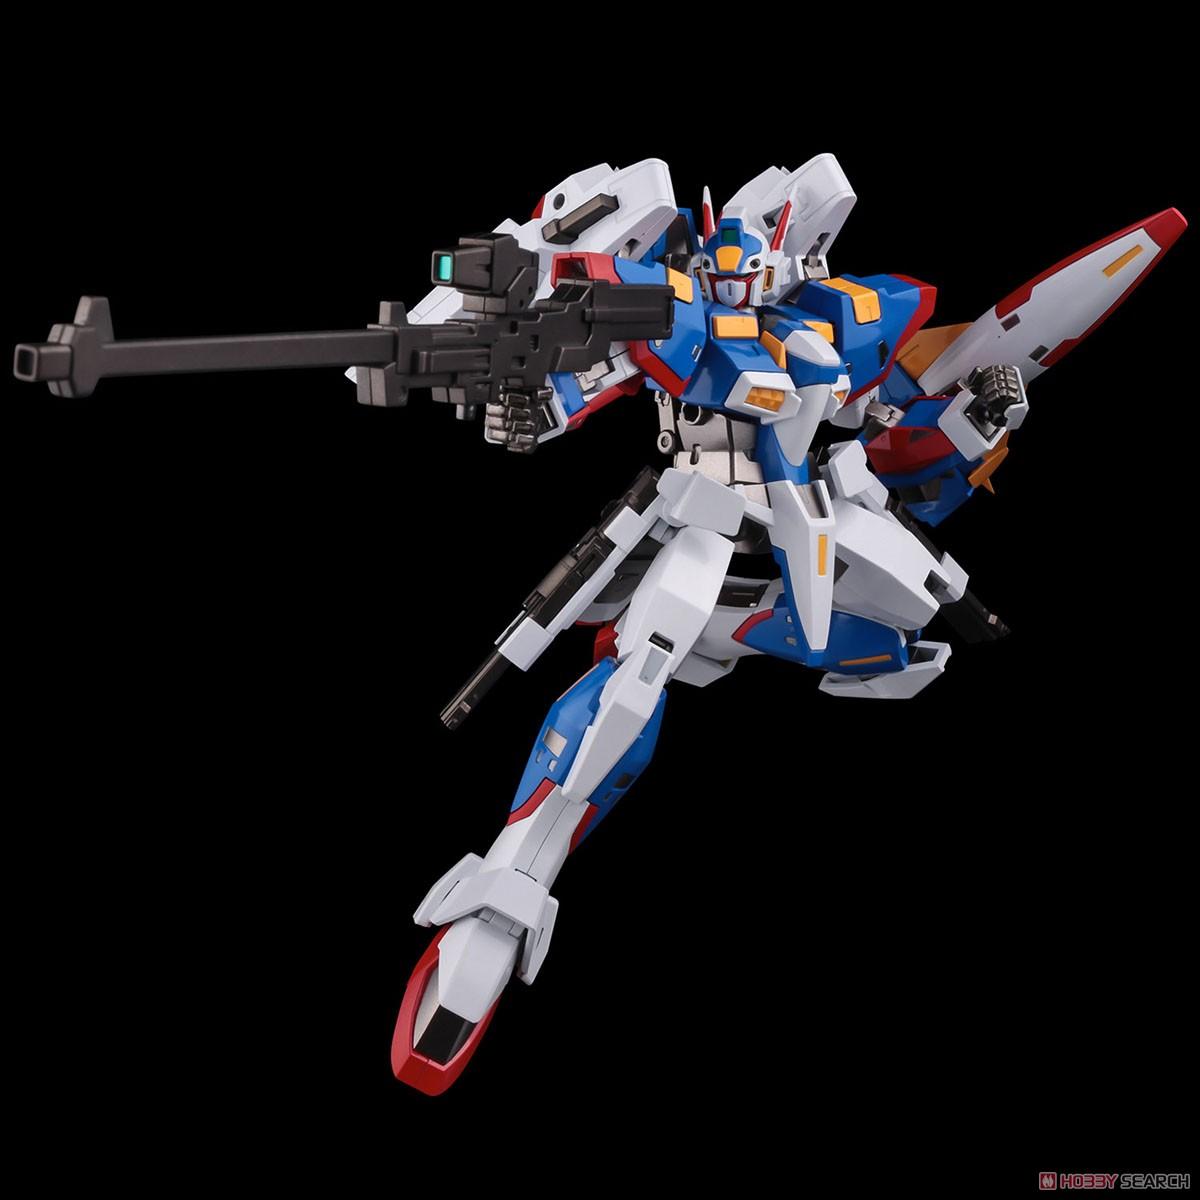 RIOBOT『変形合体 R-1』スーパーロボット大戦OG 可変合体フィギュア-005